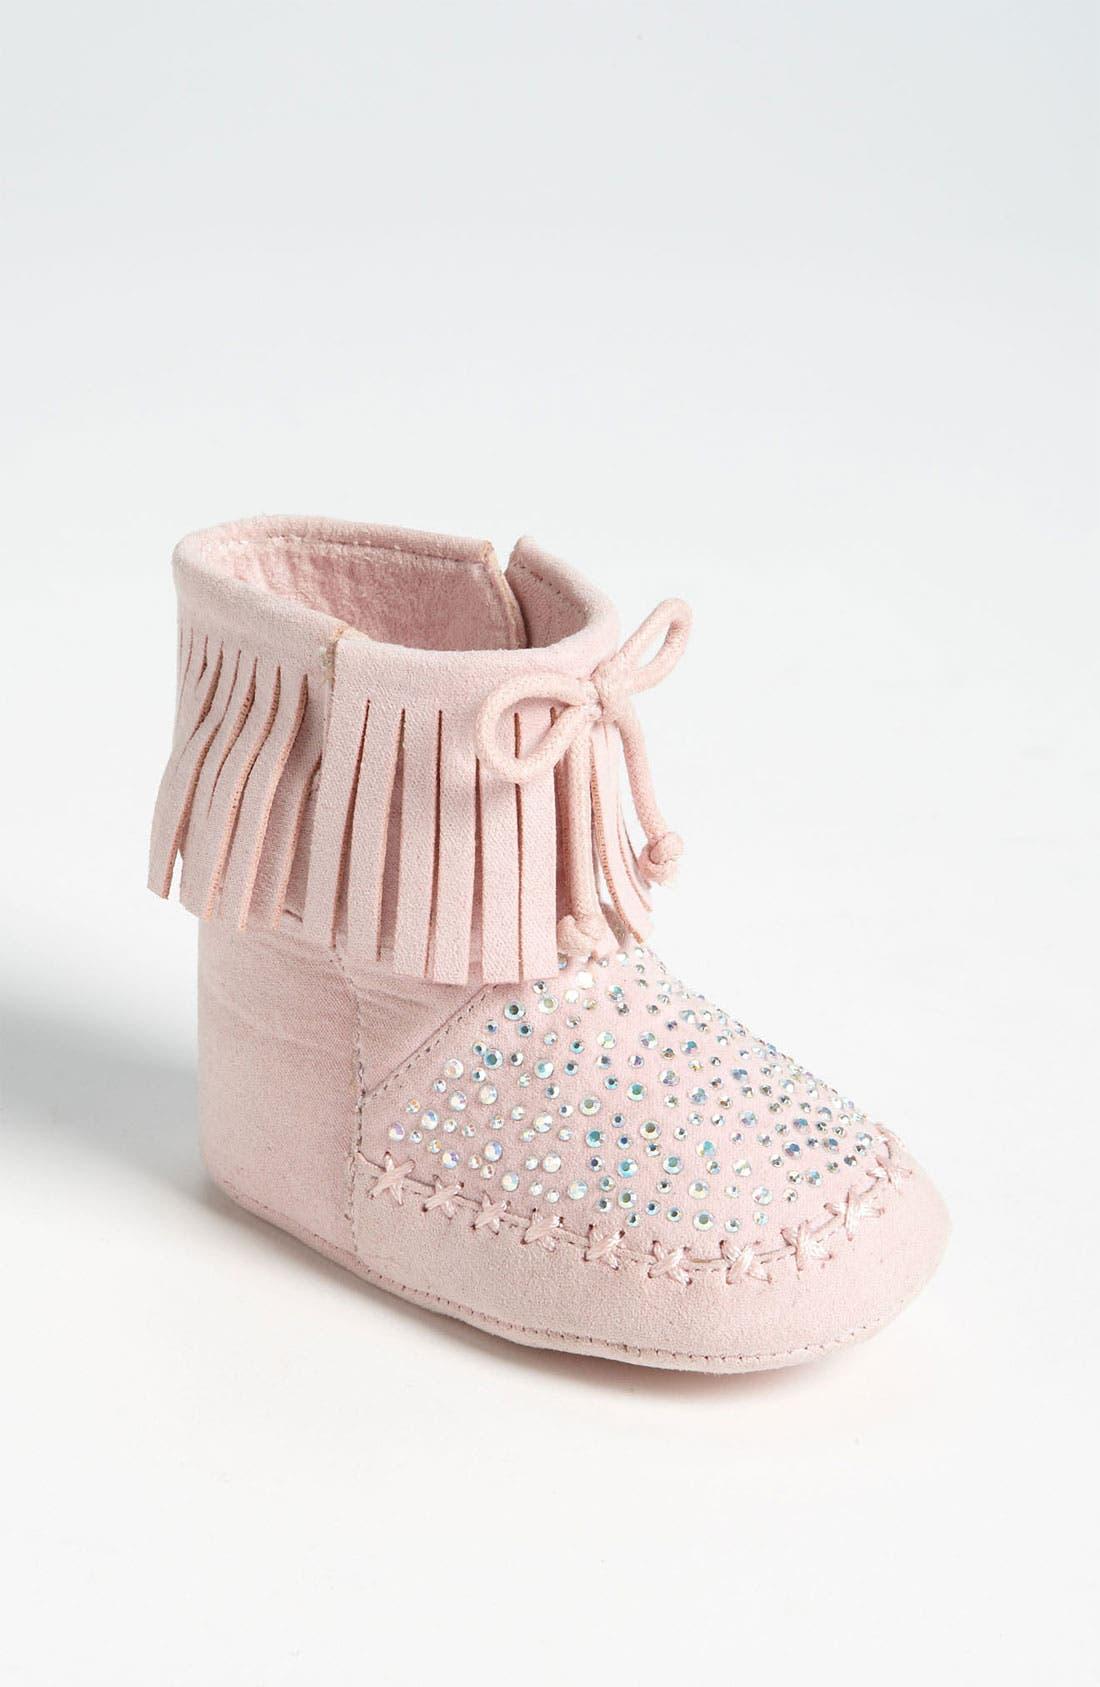 Main Image - Stuart Weitzman 'Baby Moctail' Crib Shoe (Baby)